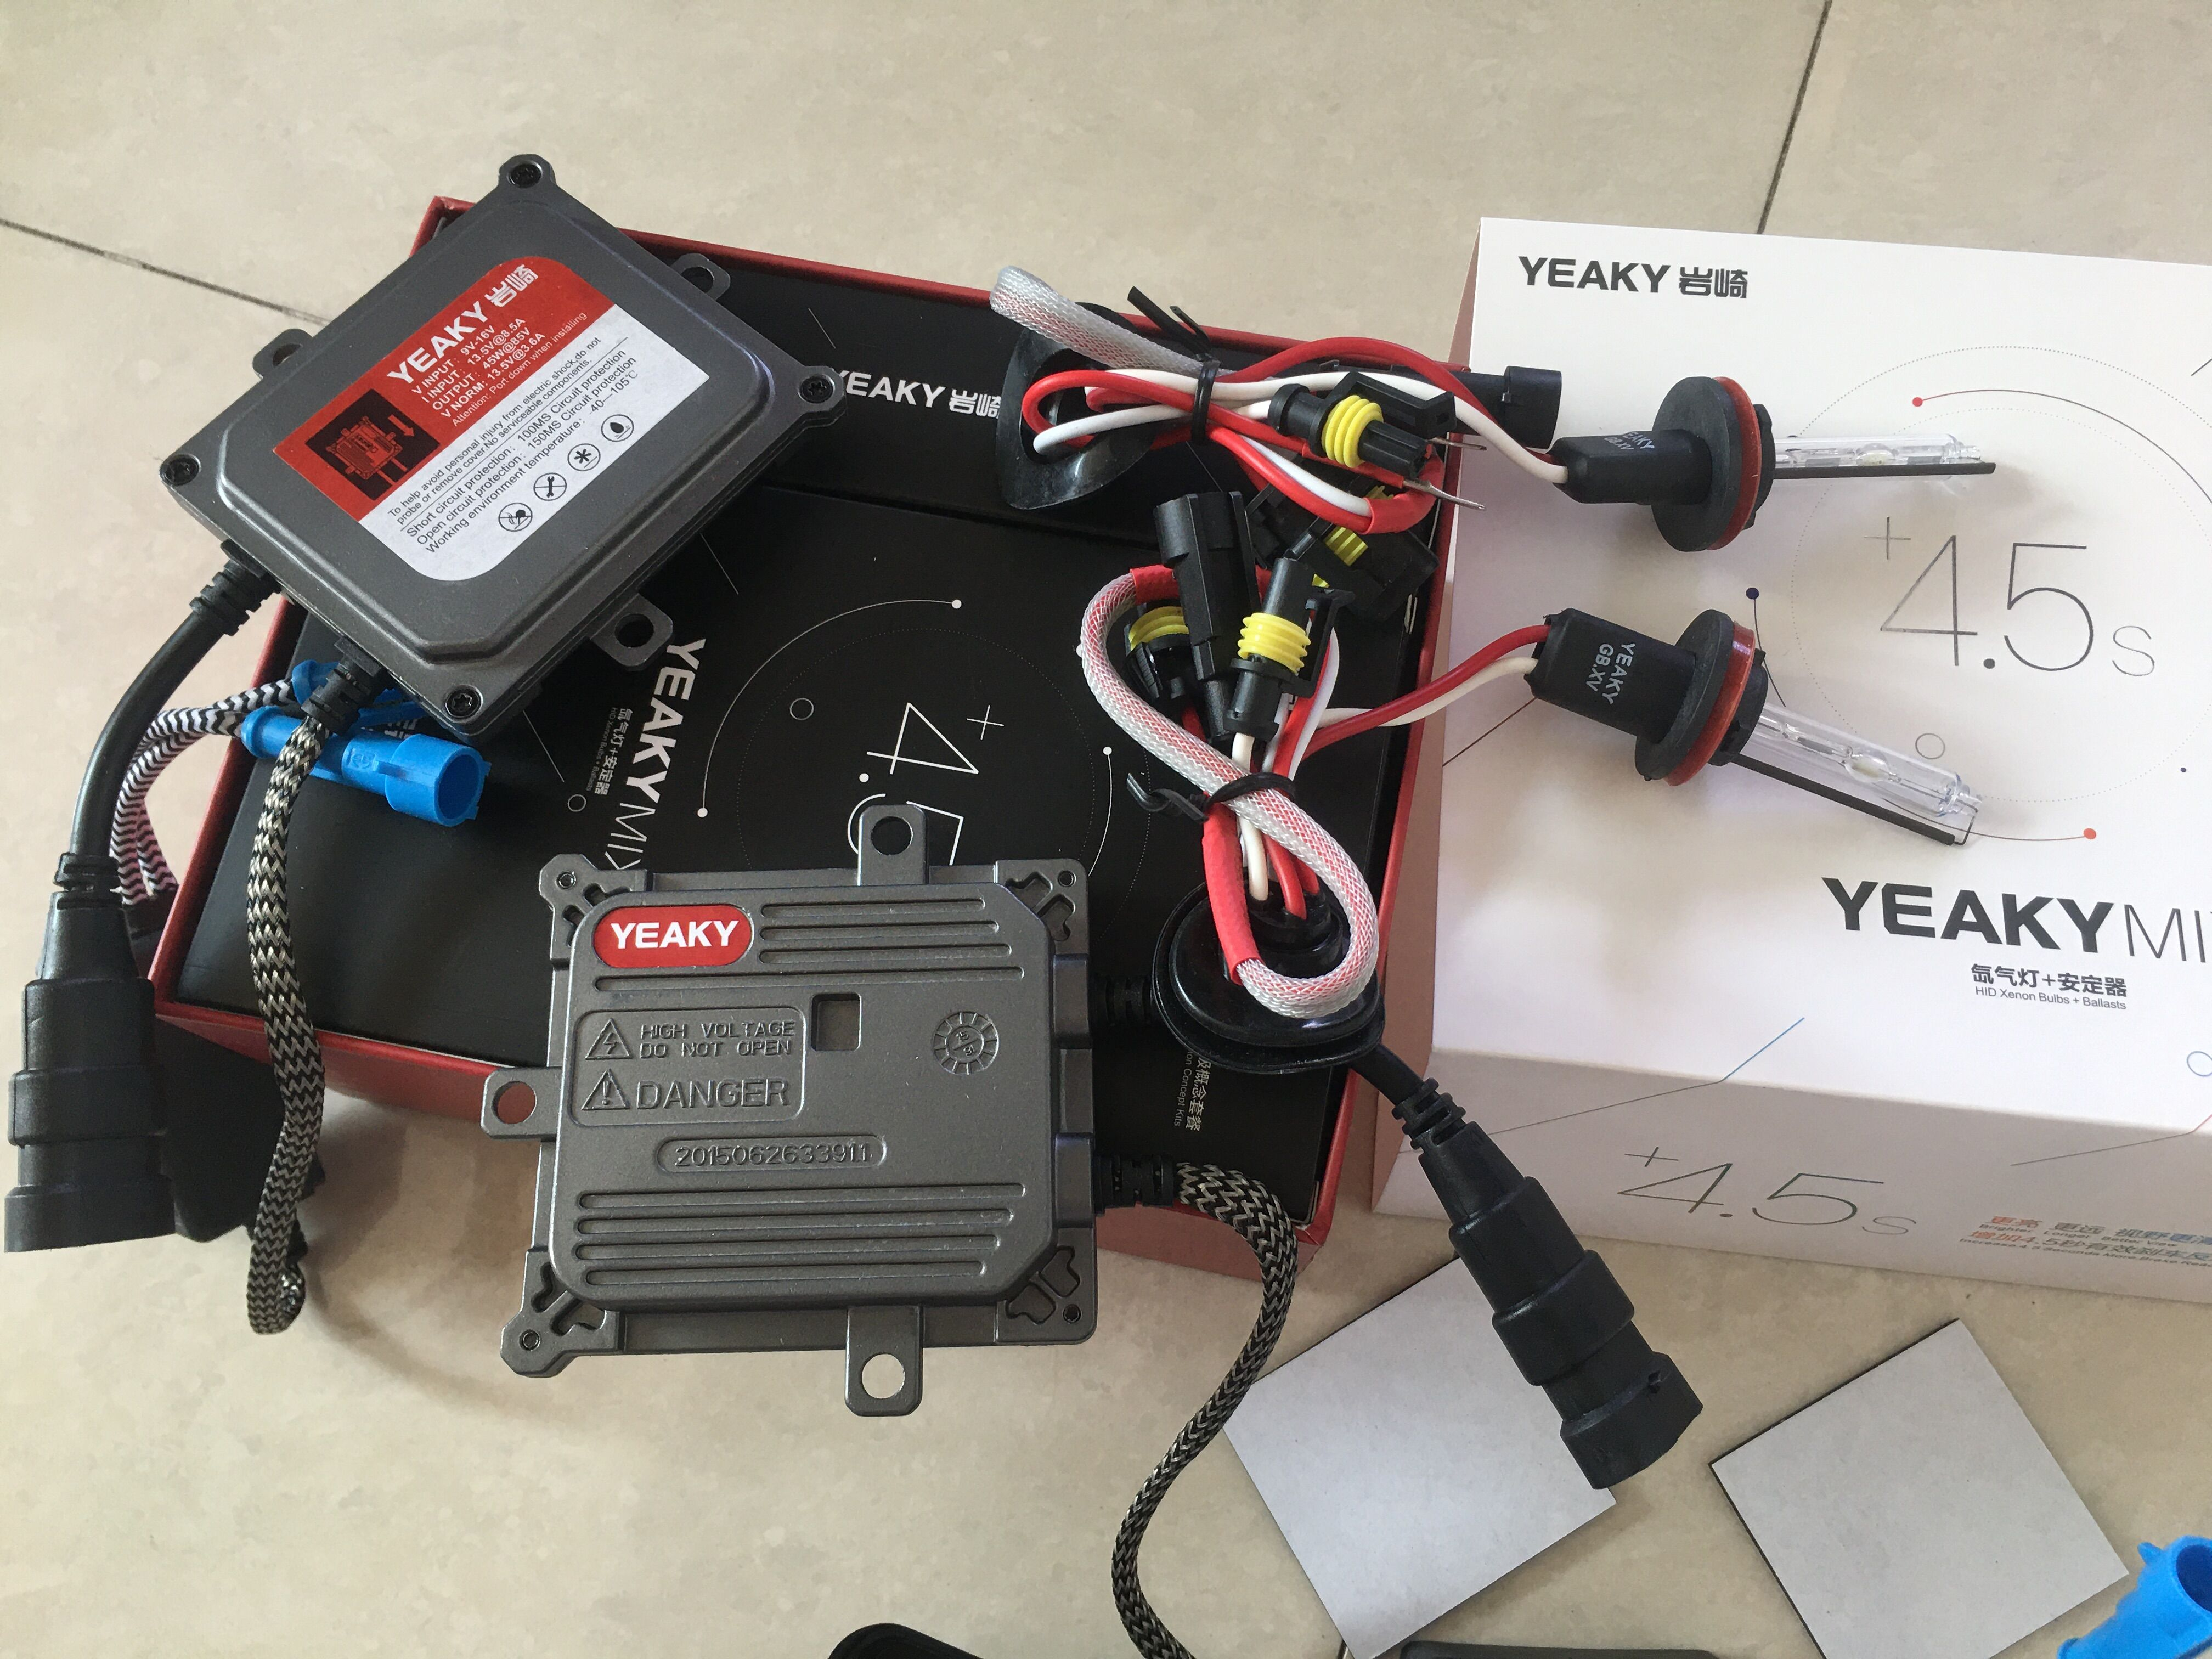 New 45W Yeaky Xenon Kit H1 H3 H7 H11 9005 9006 Fast Bright Original Yeaky 5500K HID Light For Car Headlight Bulbs HID Xenon Kit